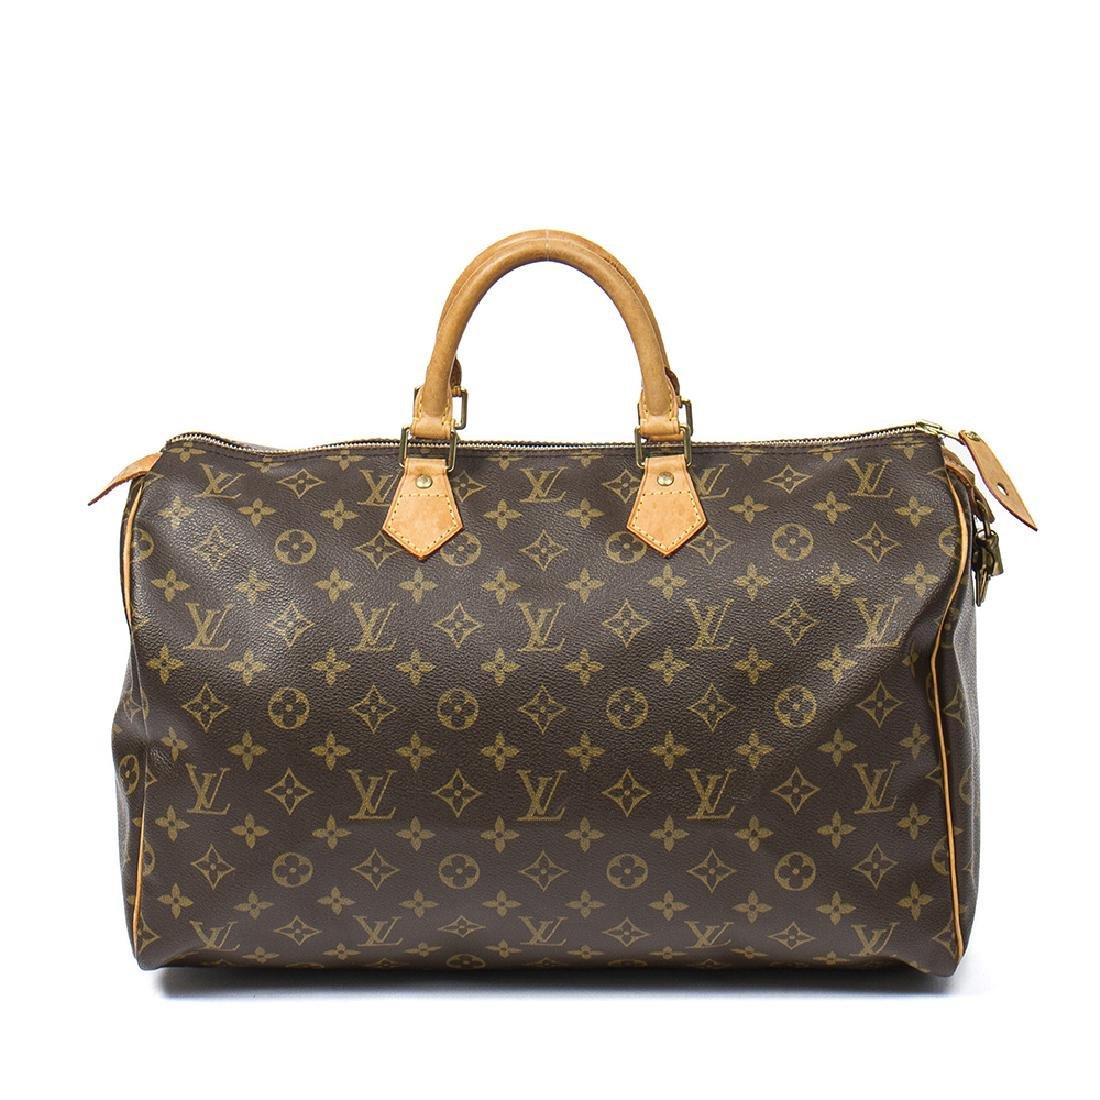 Louis Vuitton Speedy - 4